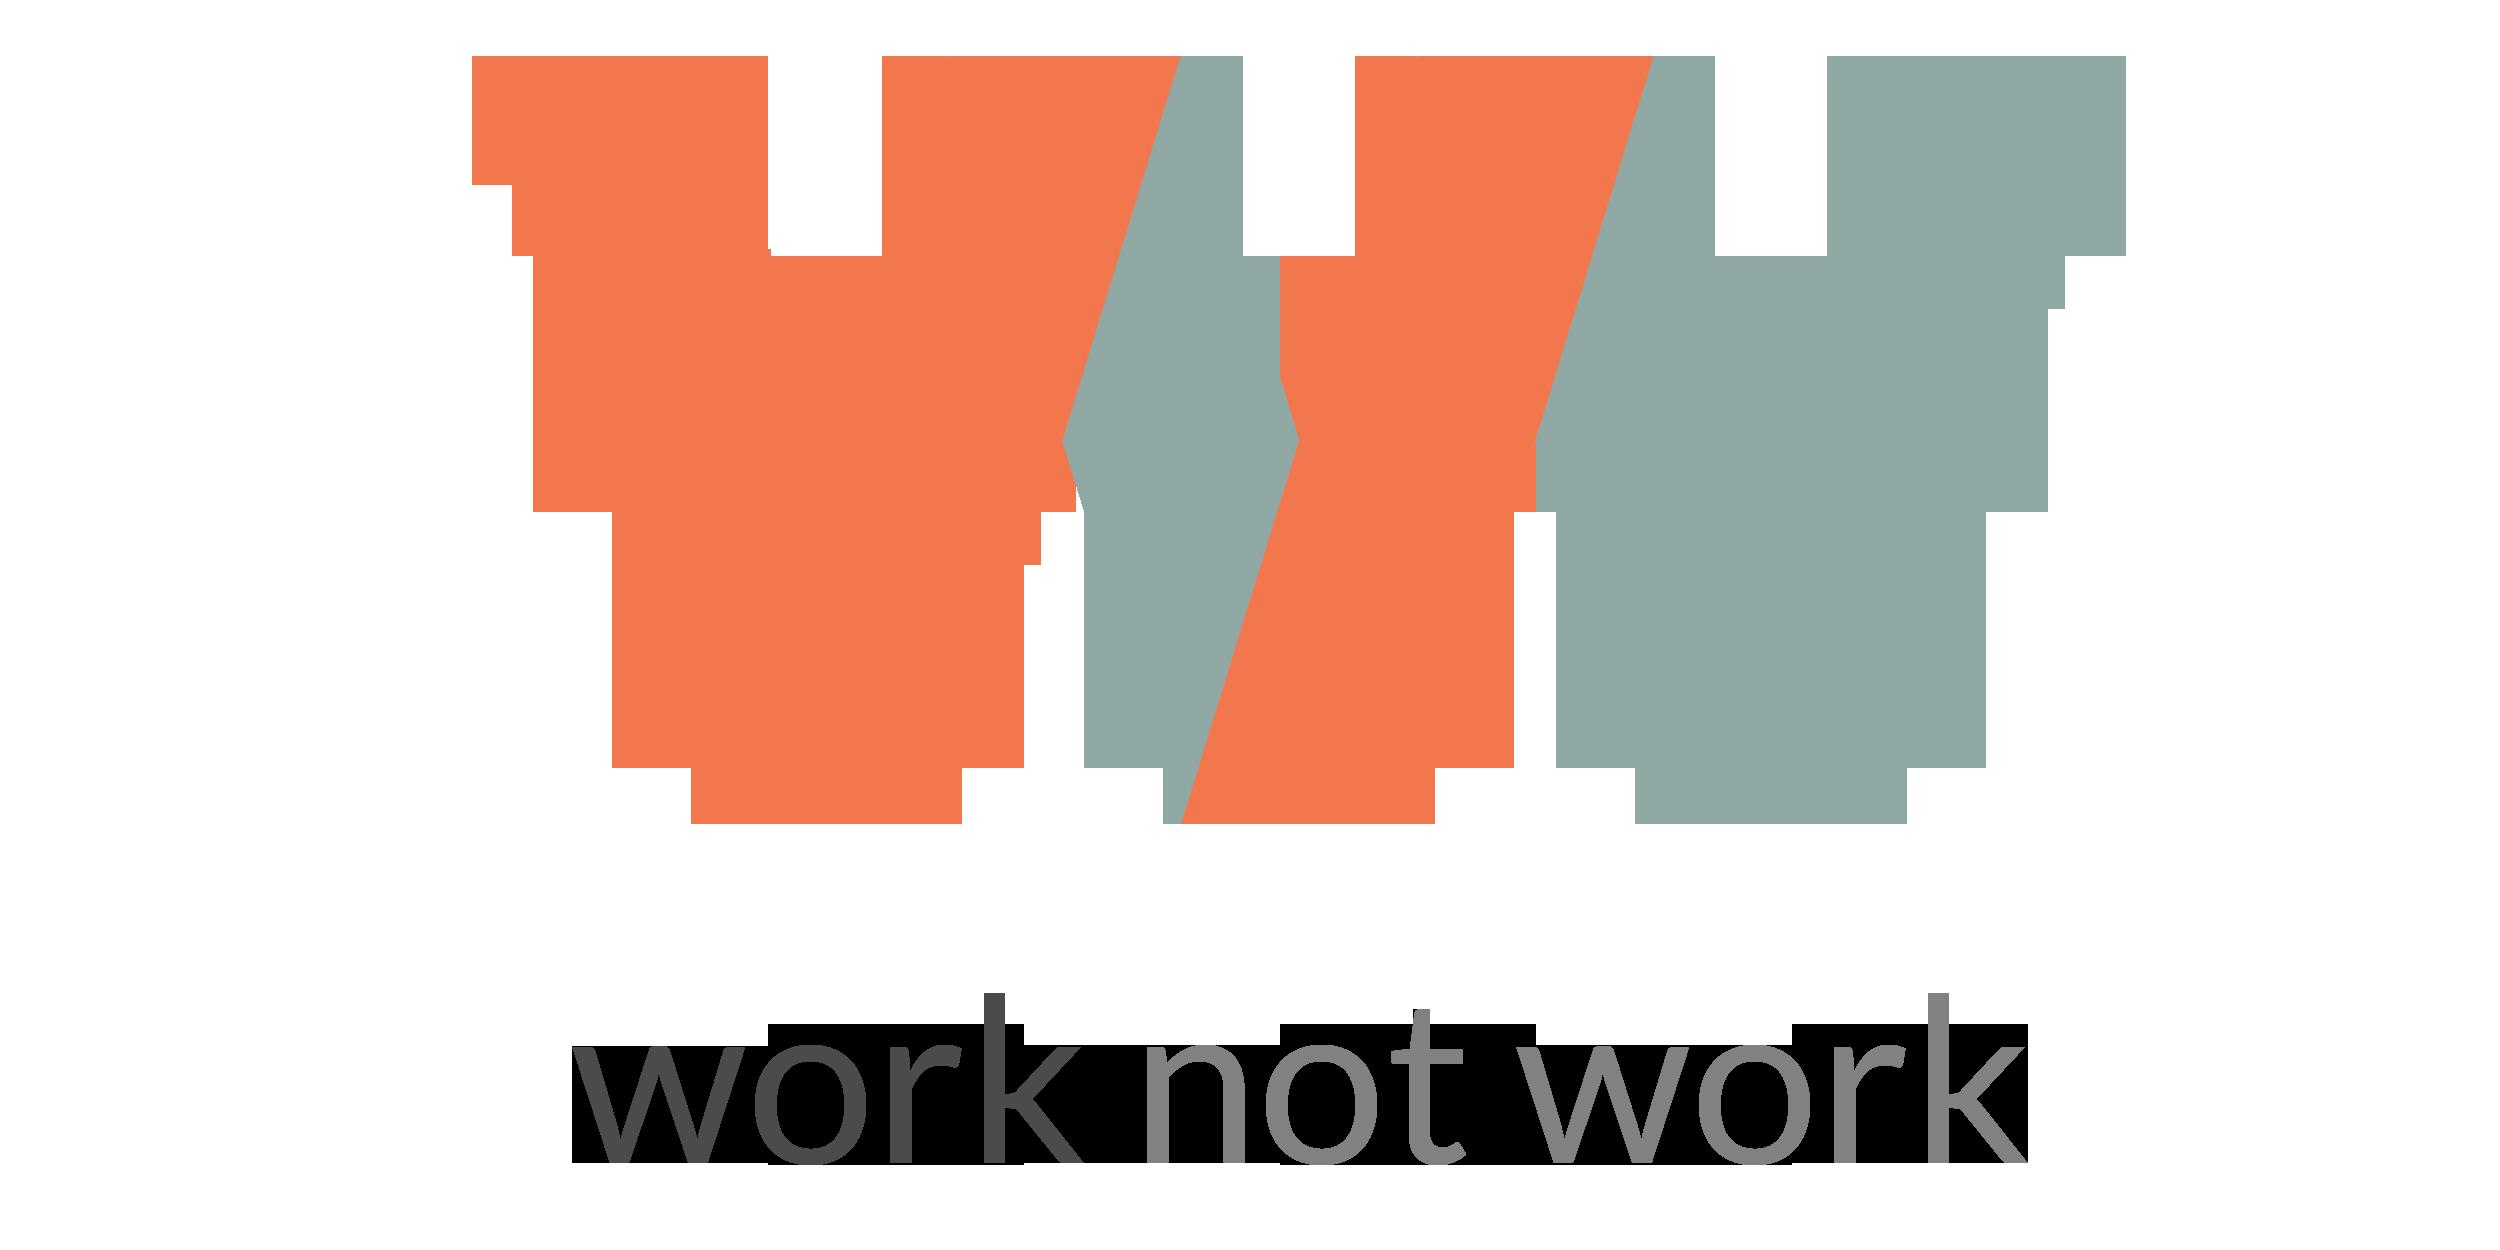 Ho Chi Minh City Firm Announces Rebranding Of 'Work Not Work' Building, Vietnam